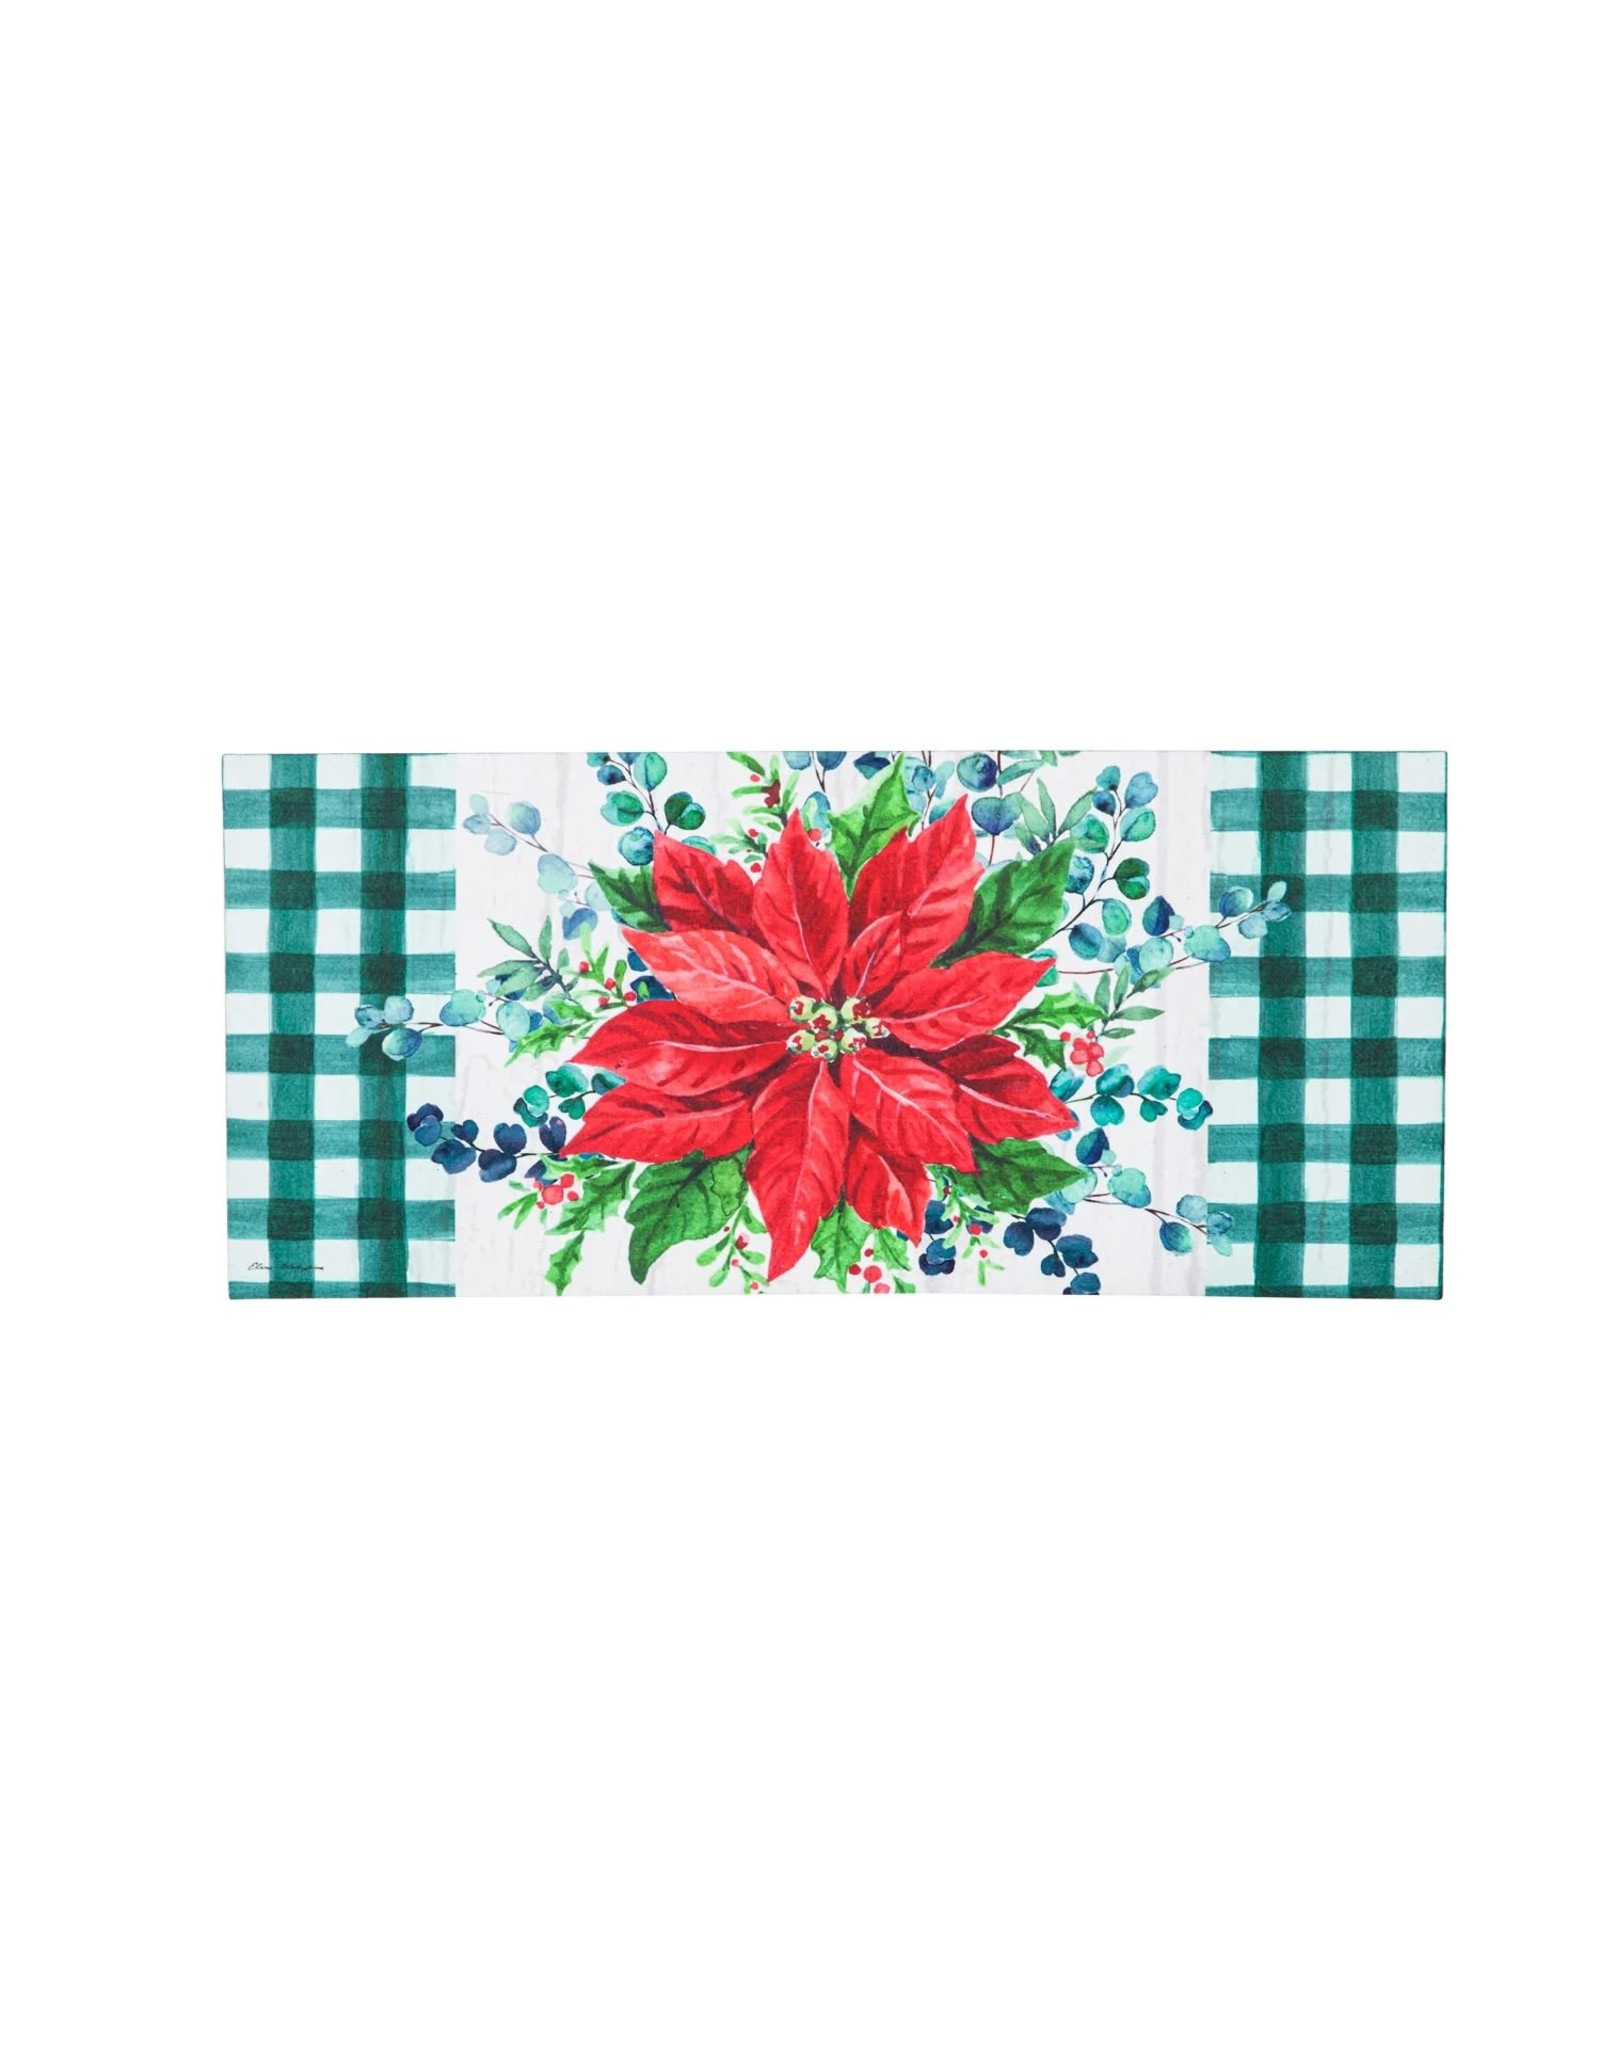 Evergreen Enterprises Merry and Bright Poinsettia Sassafras Switch Mat